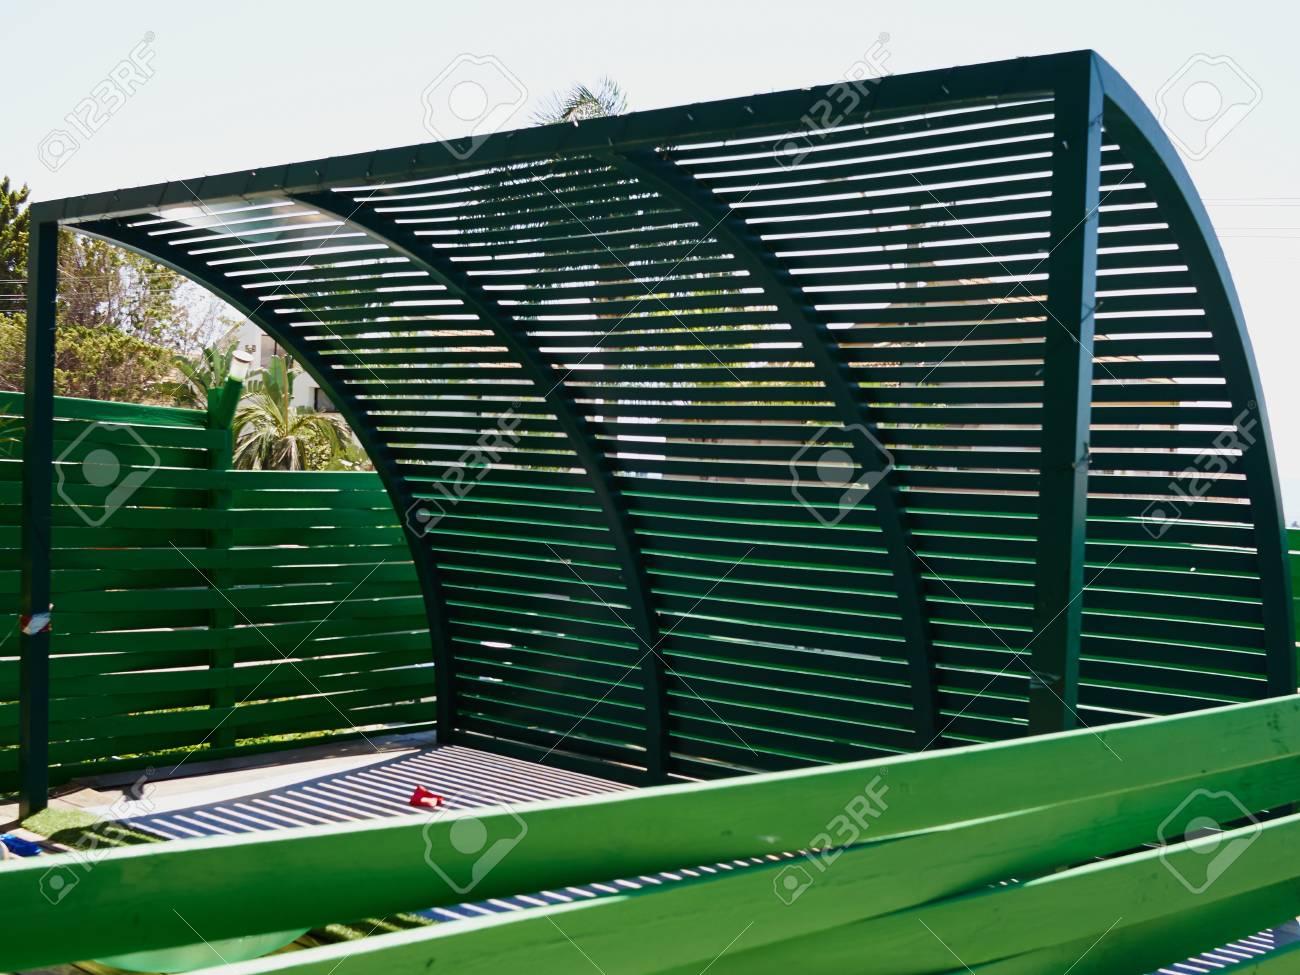 Full Size of Pergola Modern Holz Selber Bauen Design Plans Pergolas Modernas Con Policarbonato Malaysia Kits Uk Designs Australia De Aluminio Kaufen Moderna In Alluminio Wohnzimmer Pergola Modern